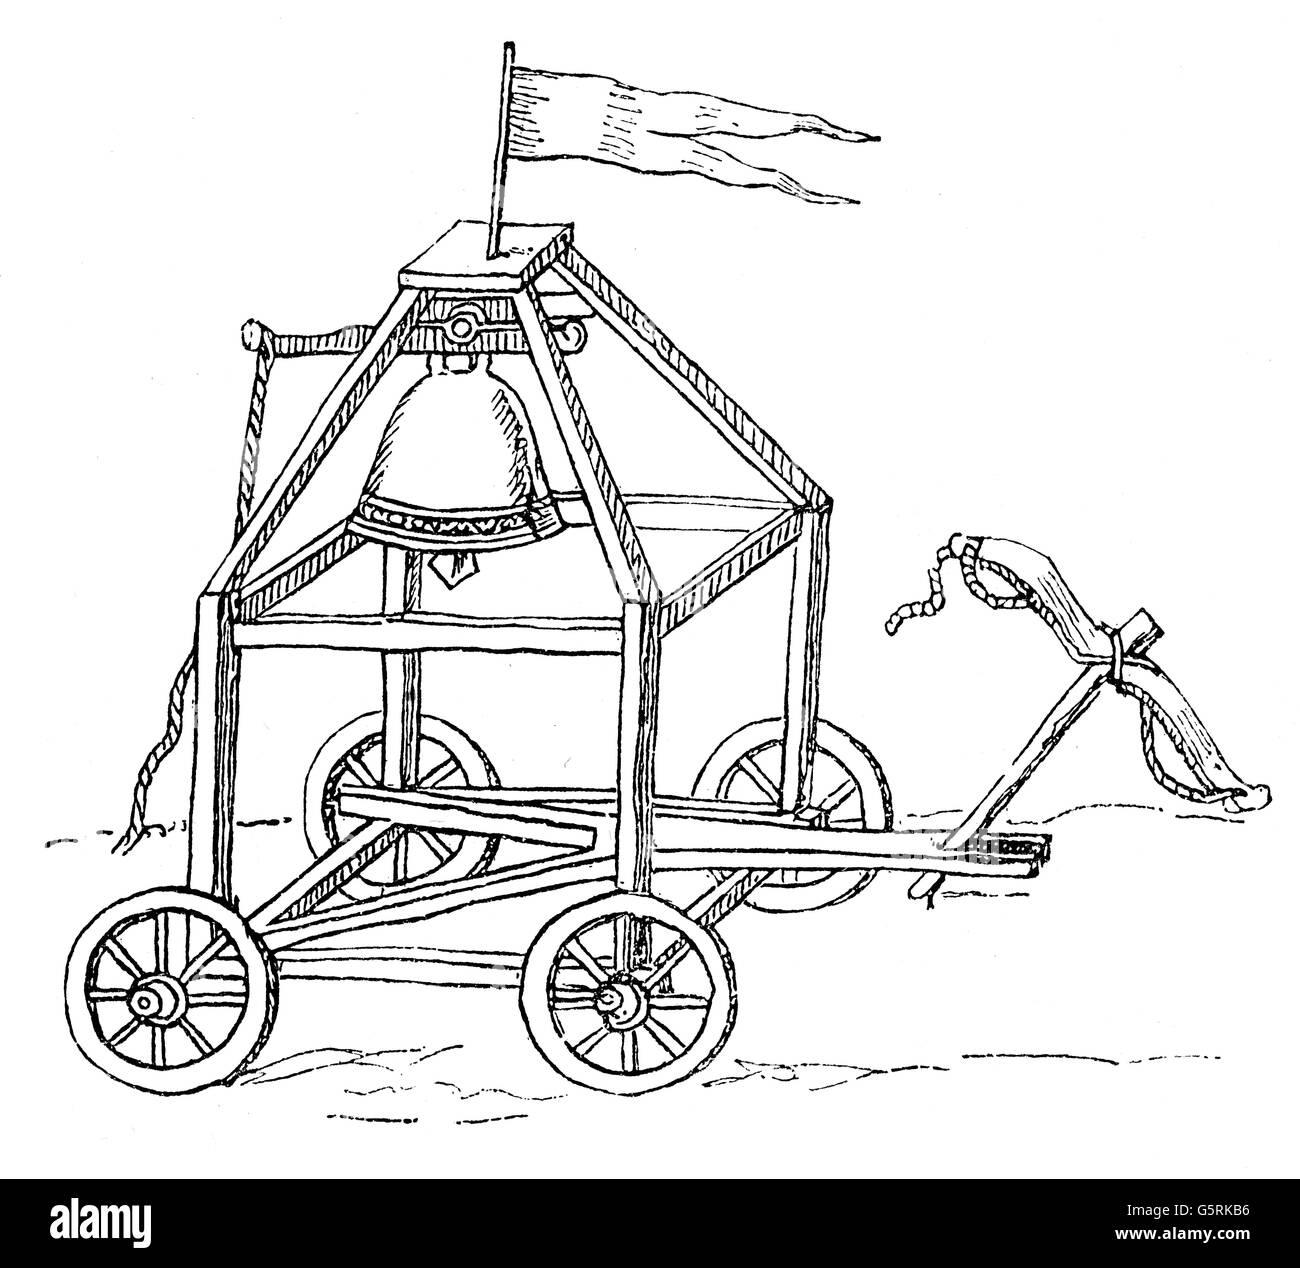 Gcroet 1pc Popolare Auto Posacenere Posacenere Con Brillante Flip Coperchio Creative Car Posacenere Portatile Per Outdoor Indoor Home Office Decorazione ab